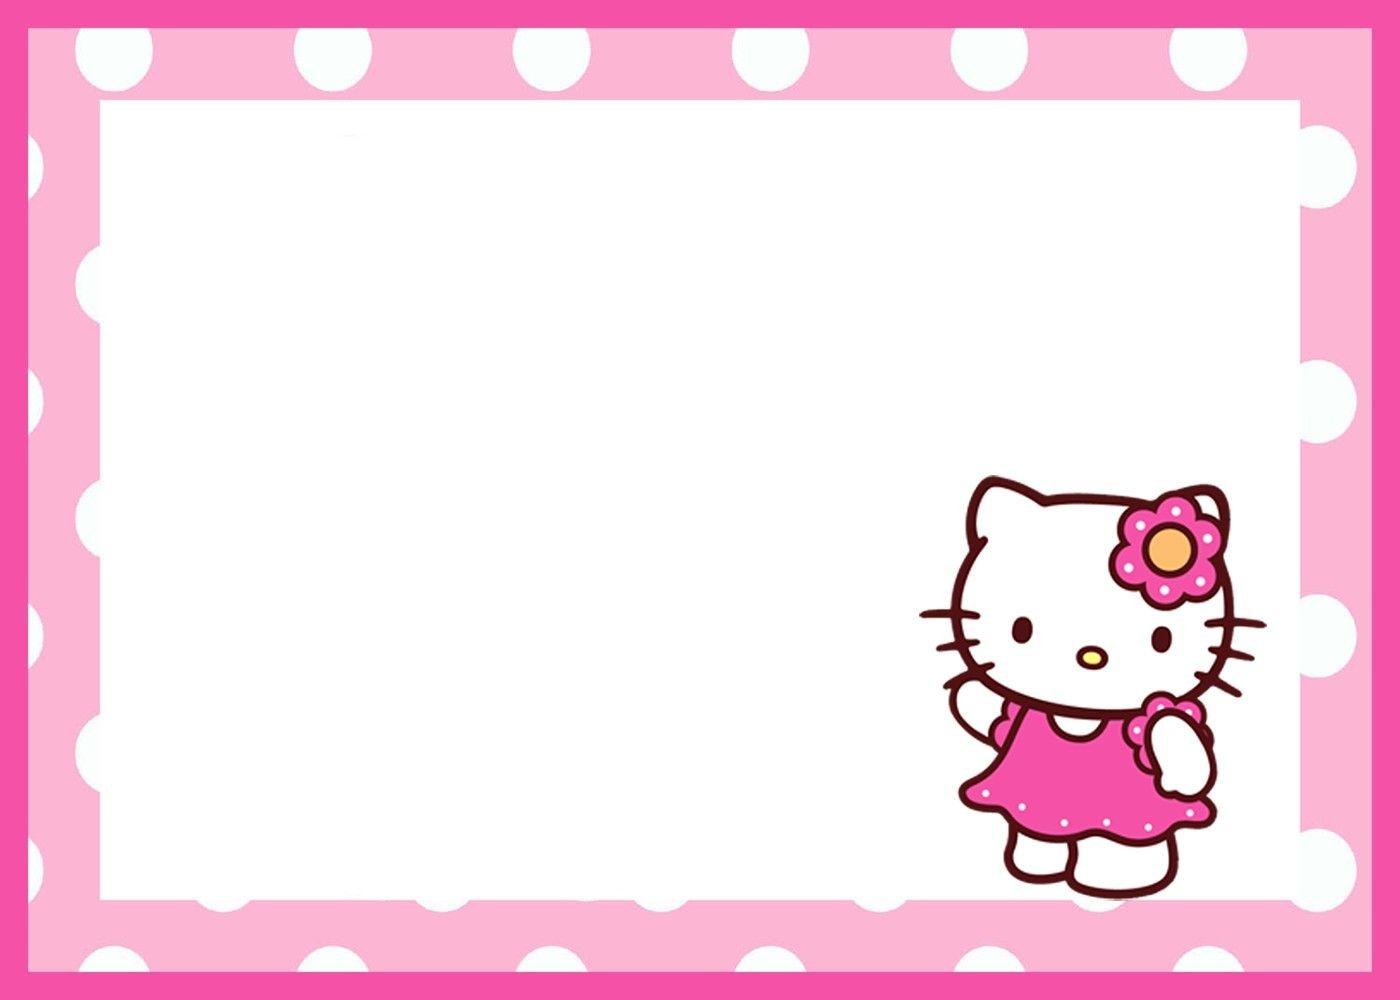 Hello Kitty Birthday Invitation Template | Javanese | Hello Kitty - Hello Kitty Free Printable Invitations For Birthday